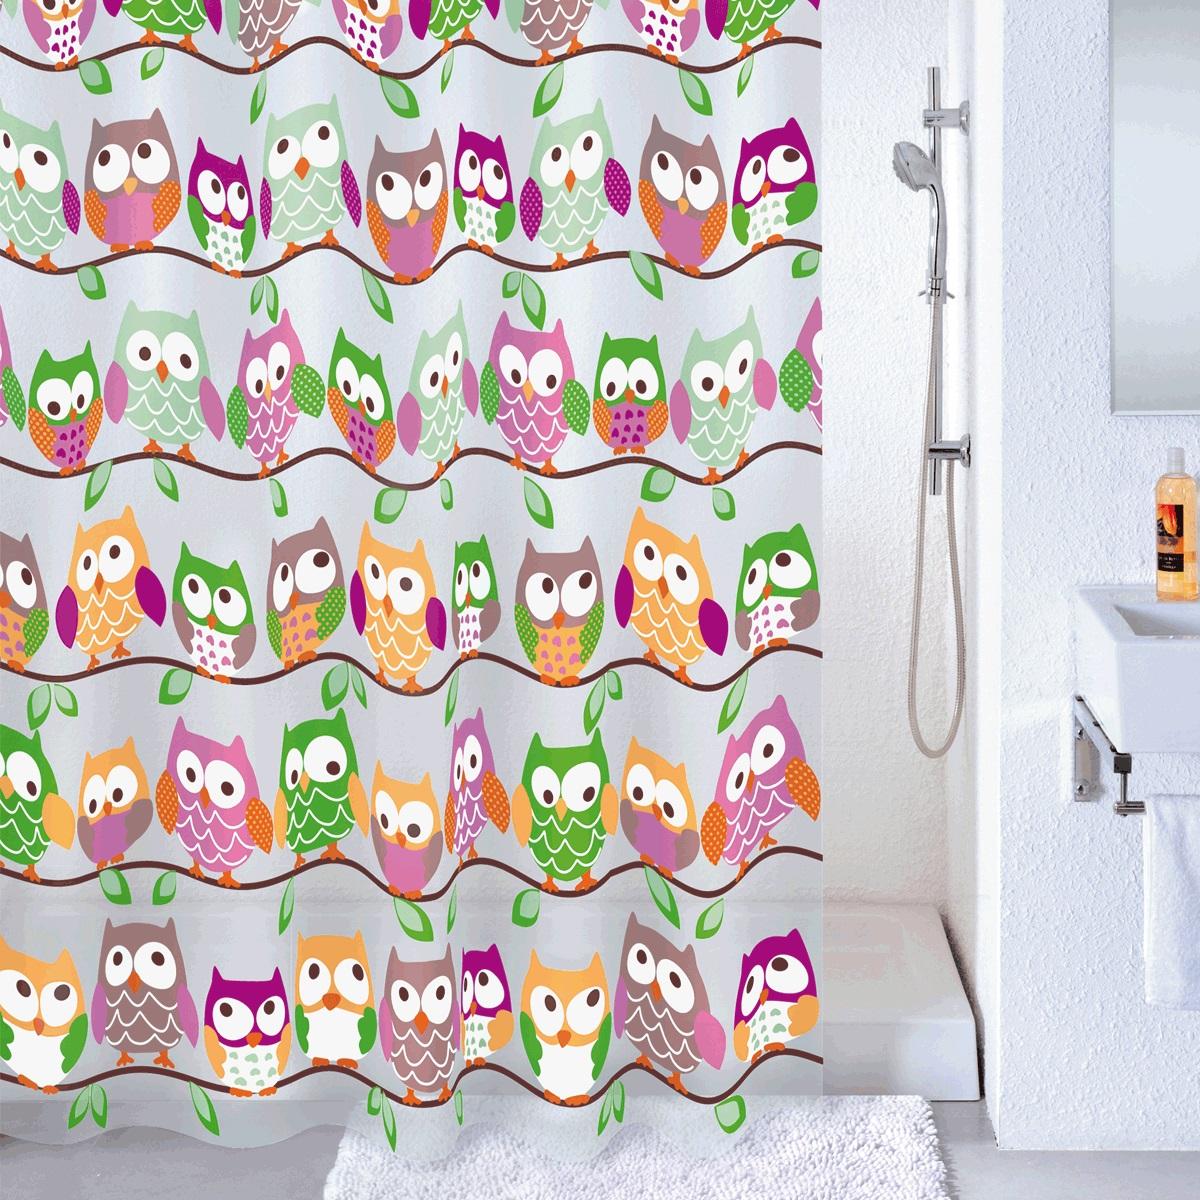 Штора для ванной Milardo Cheeky Owls, цвет: мультиколор, 180 x 180 см milardo amur amusb00m01